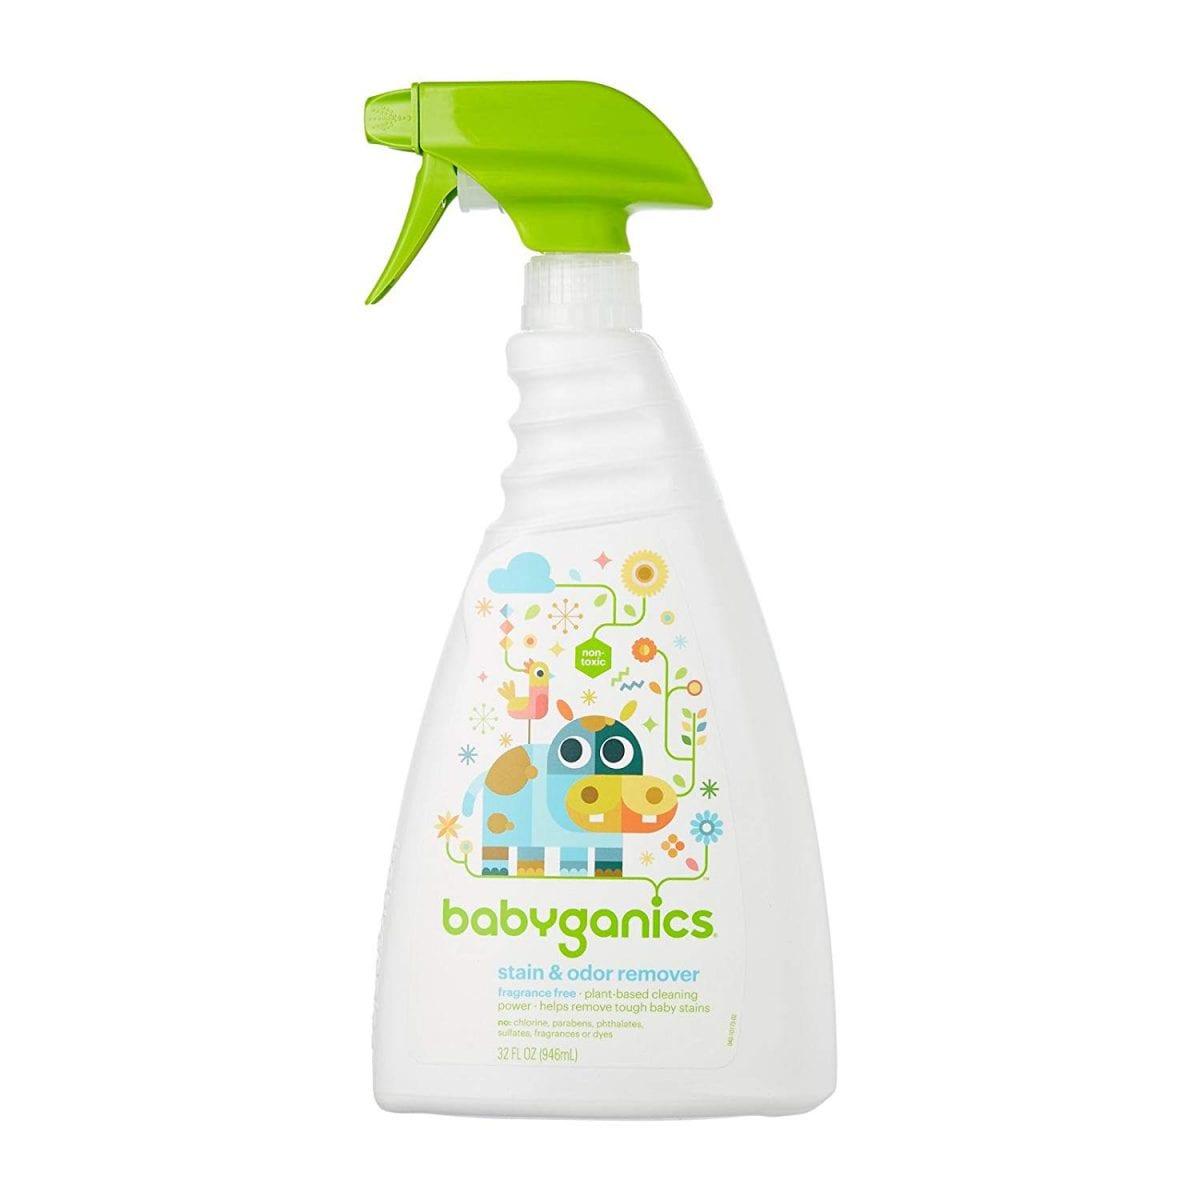 Babyganics FreeStain and Odor Remover